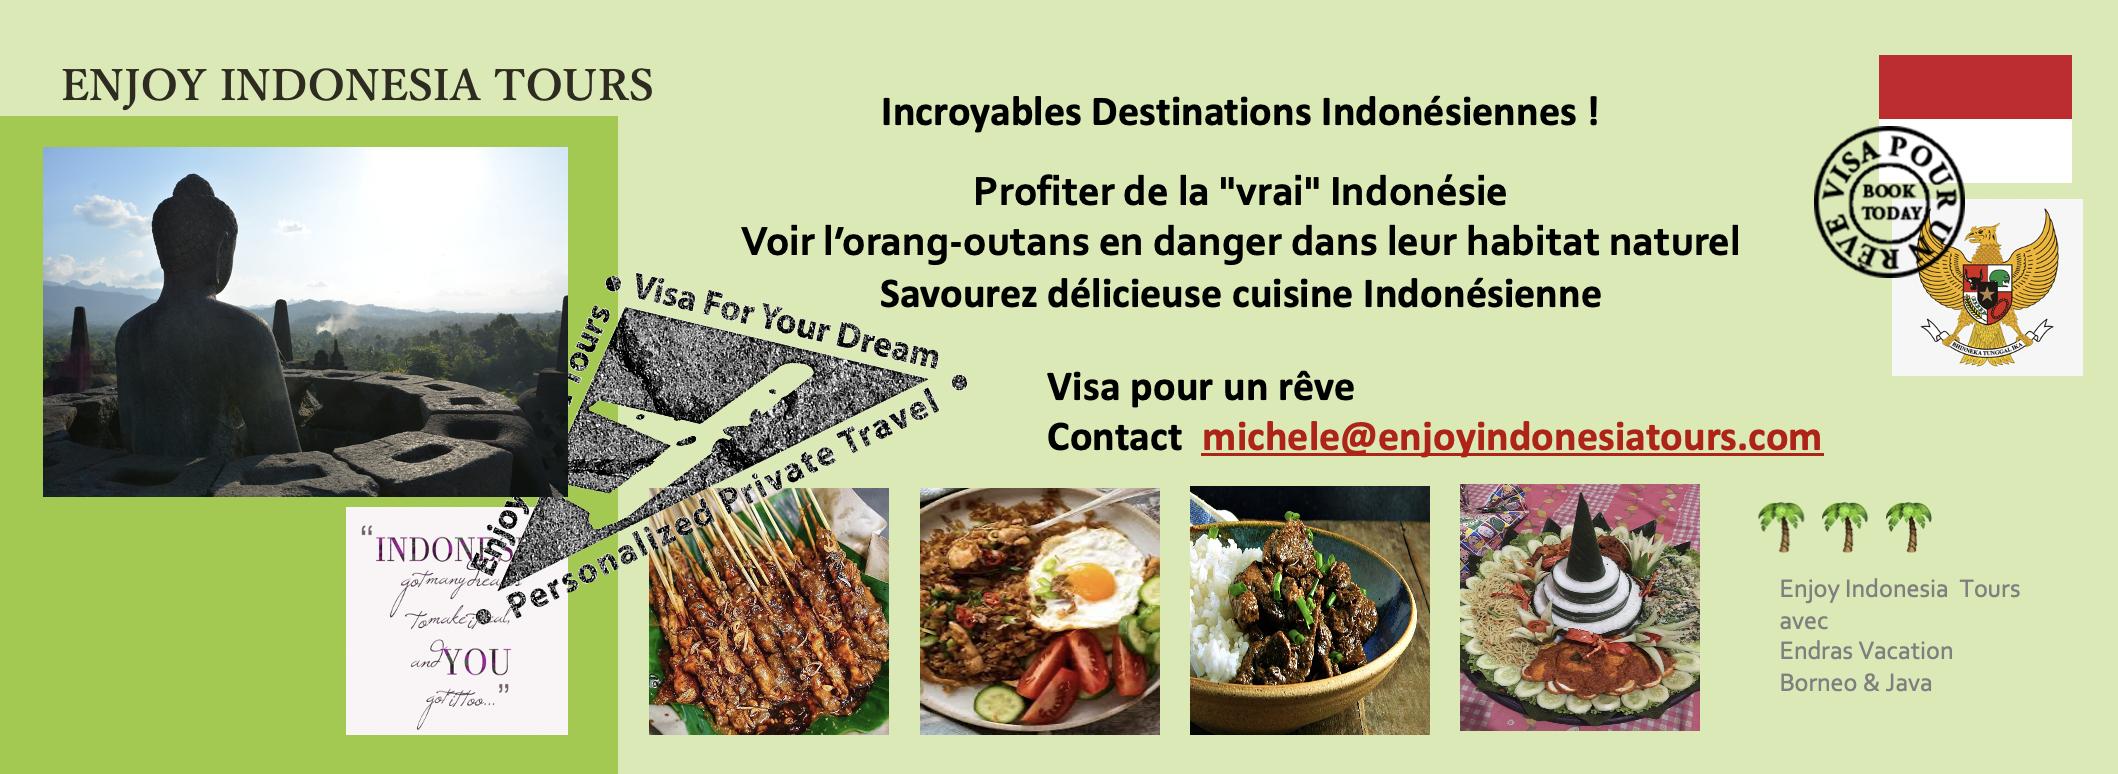 Indonesia Tours Borneo Java Pg 4 French